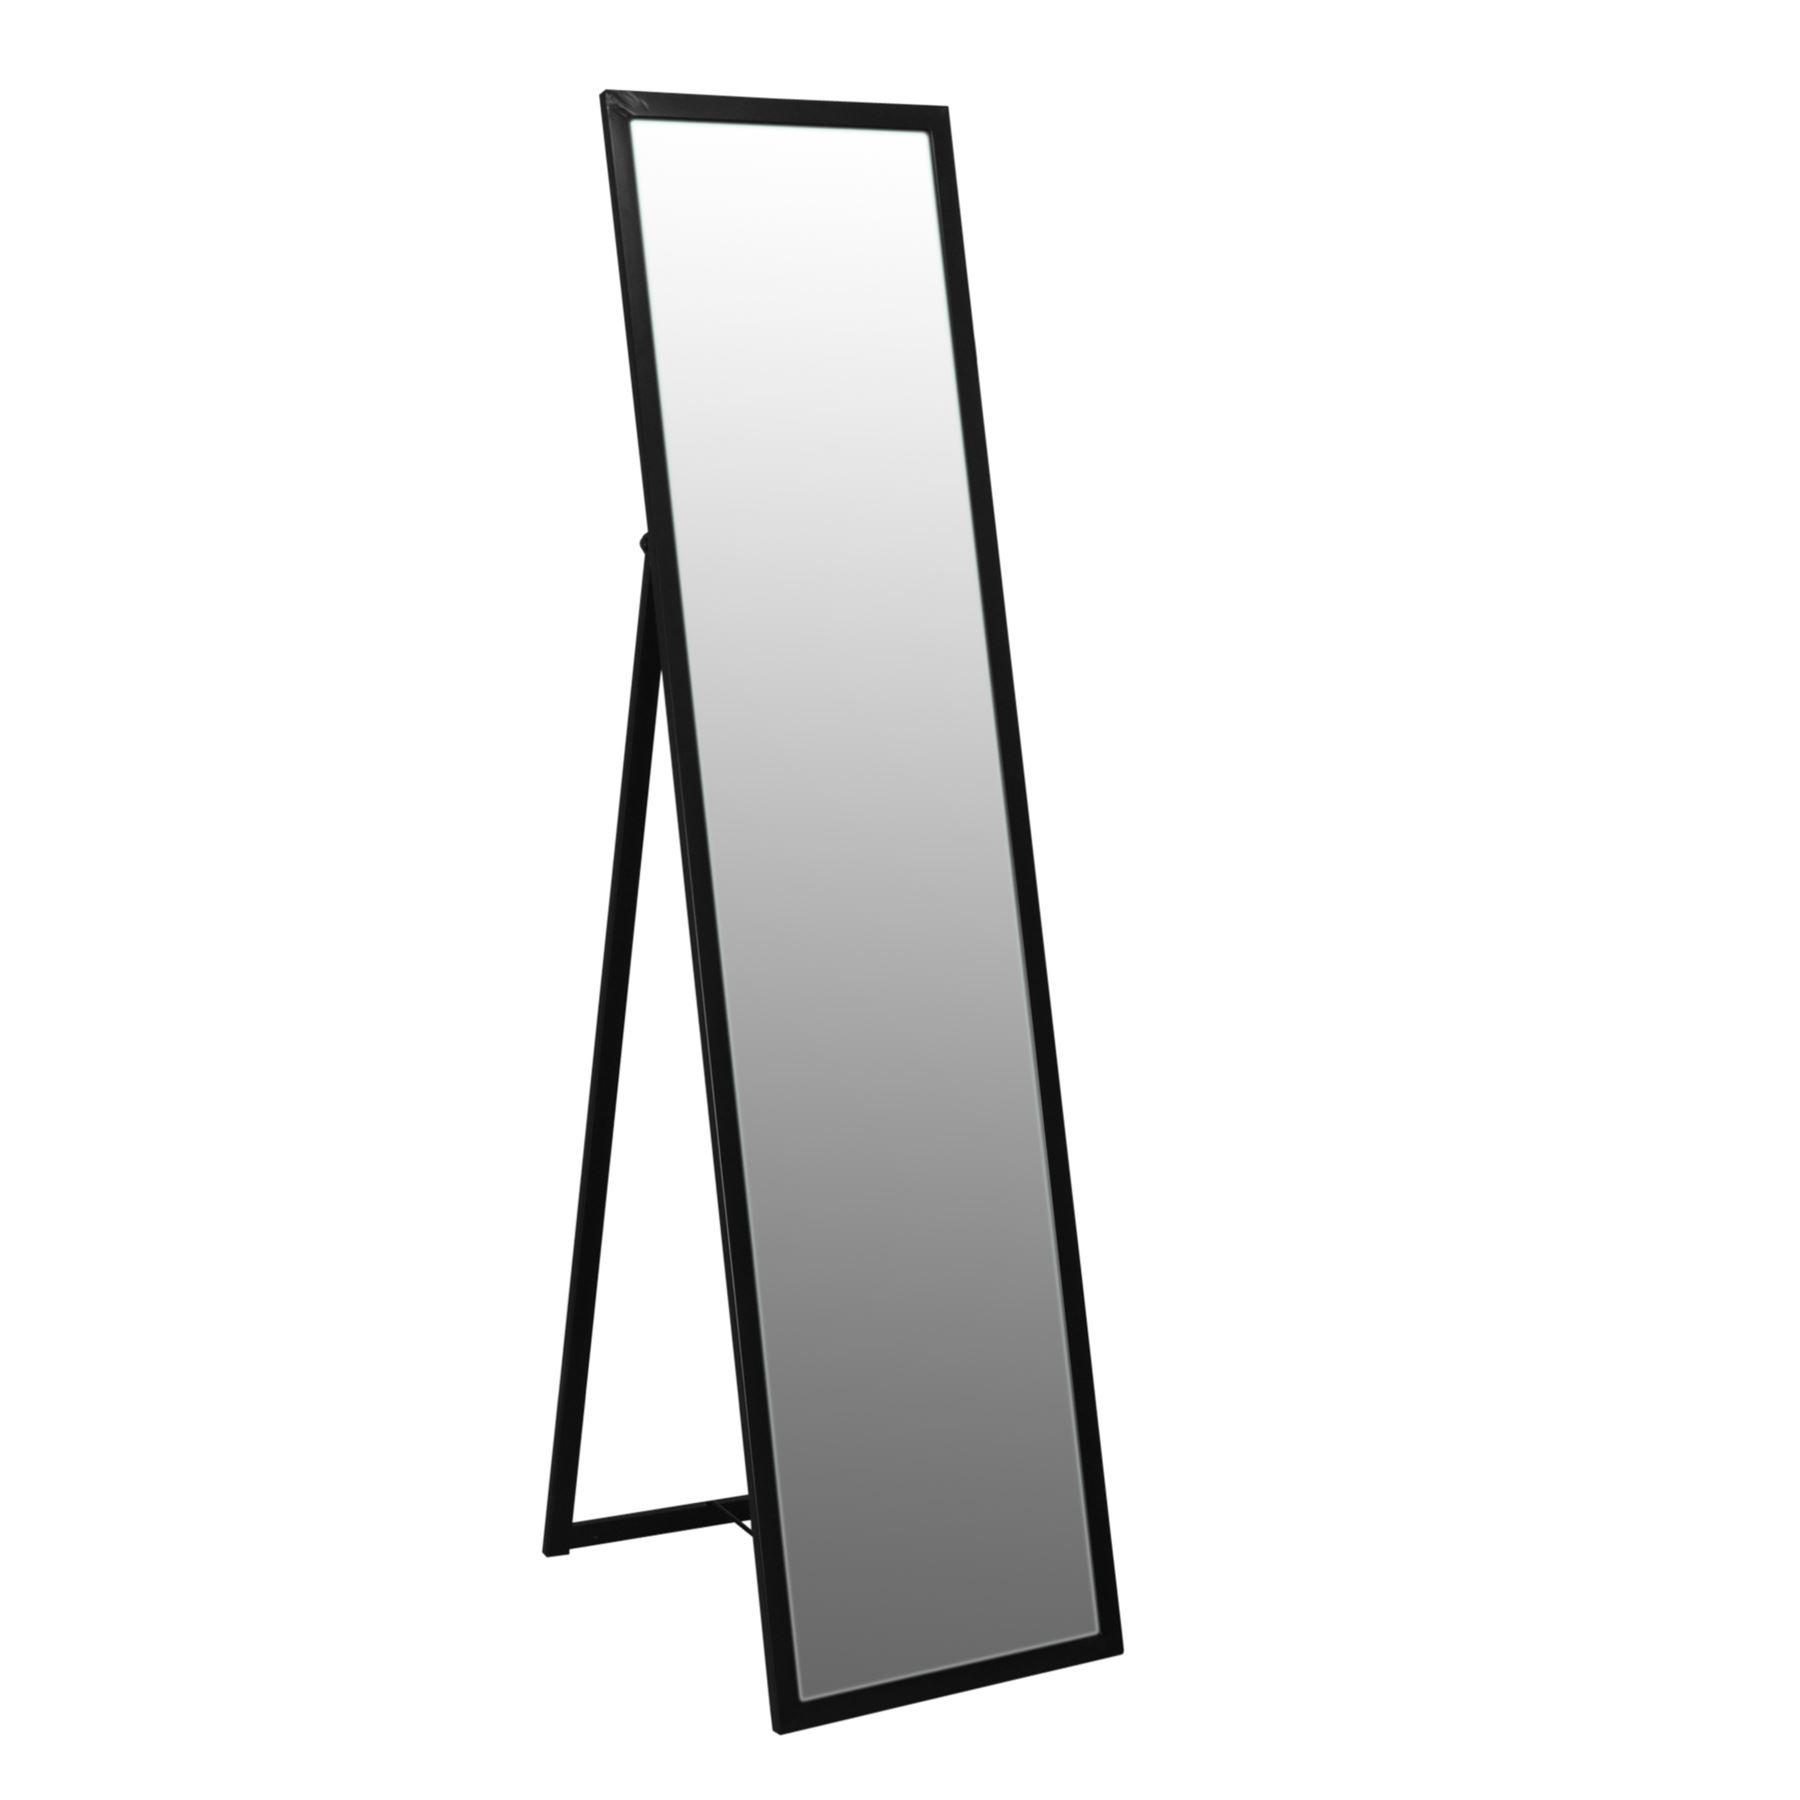 Espejo de pie espejo de cuerpo entero orientable con marco for Espejos de cuerpo entero con pie